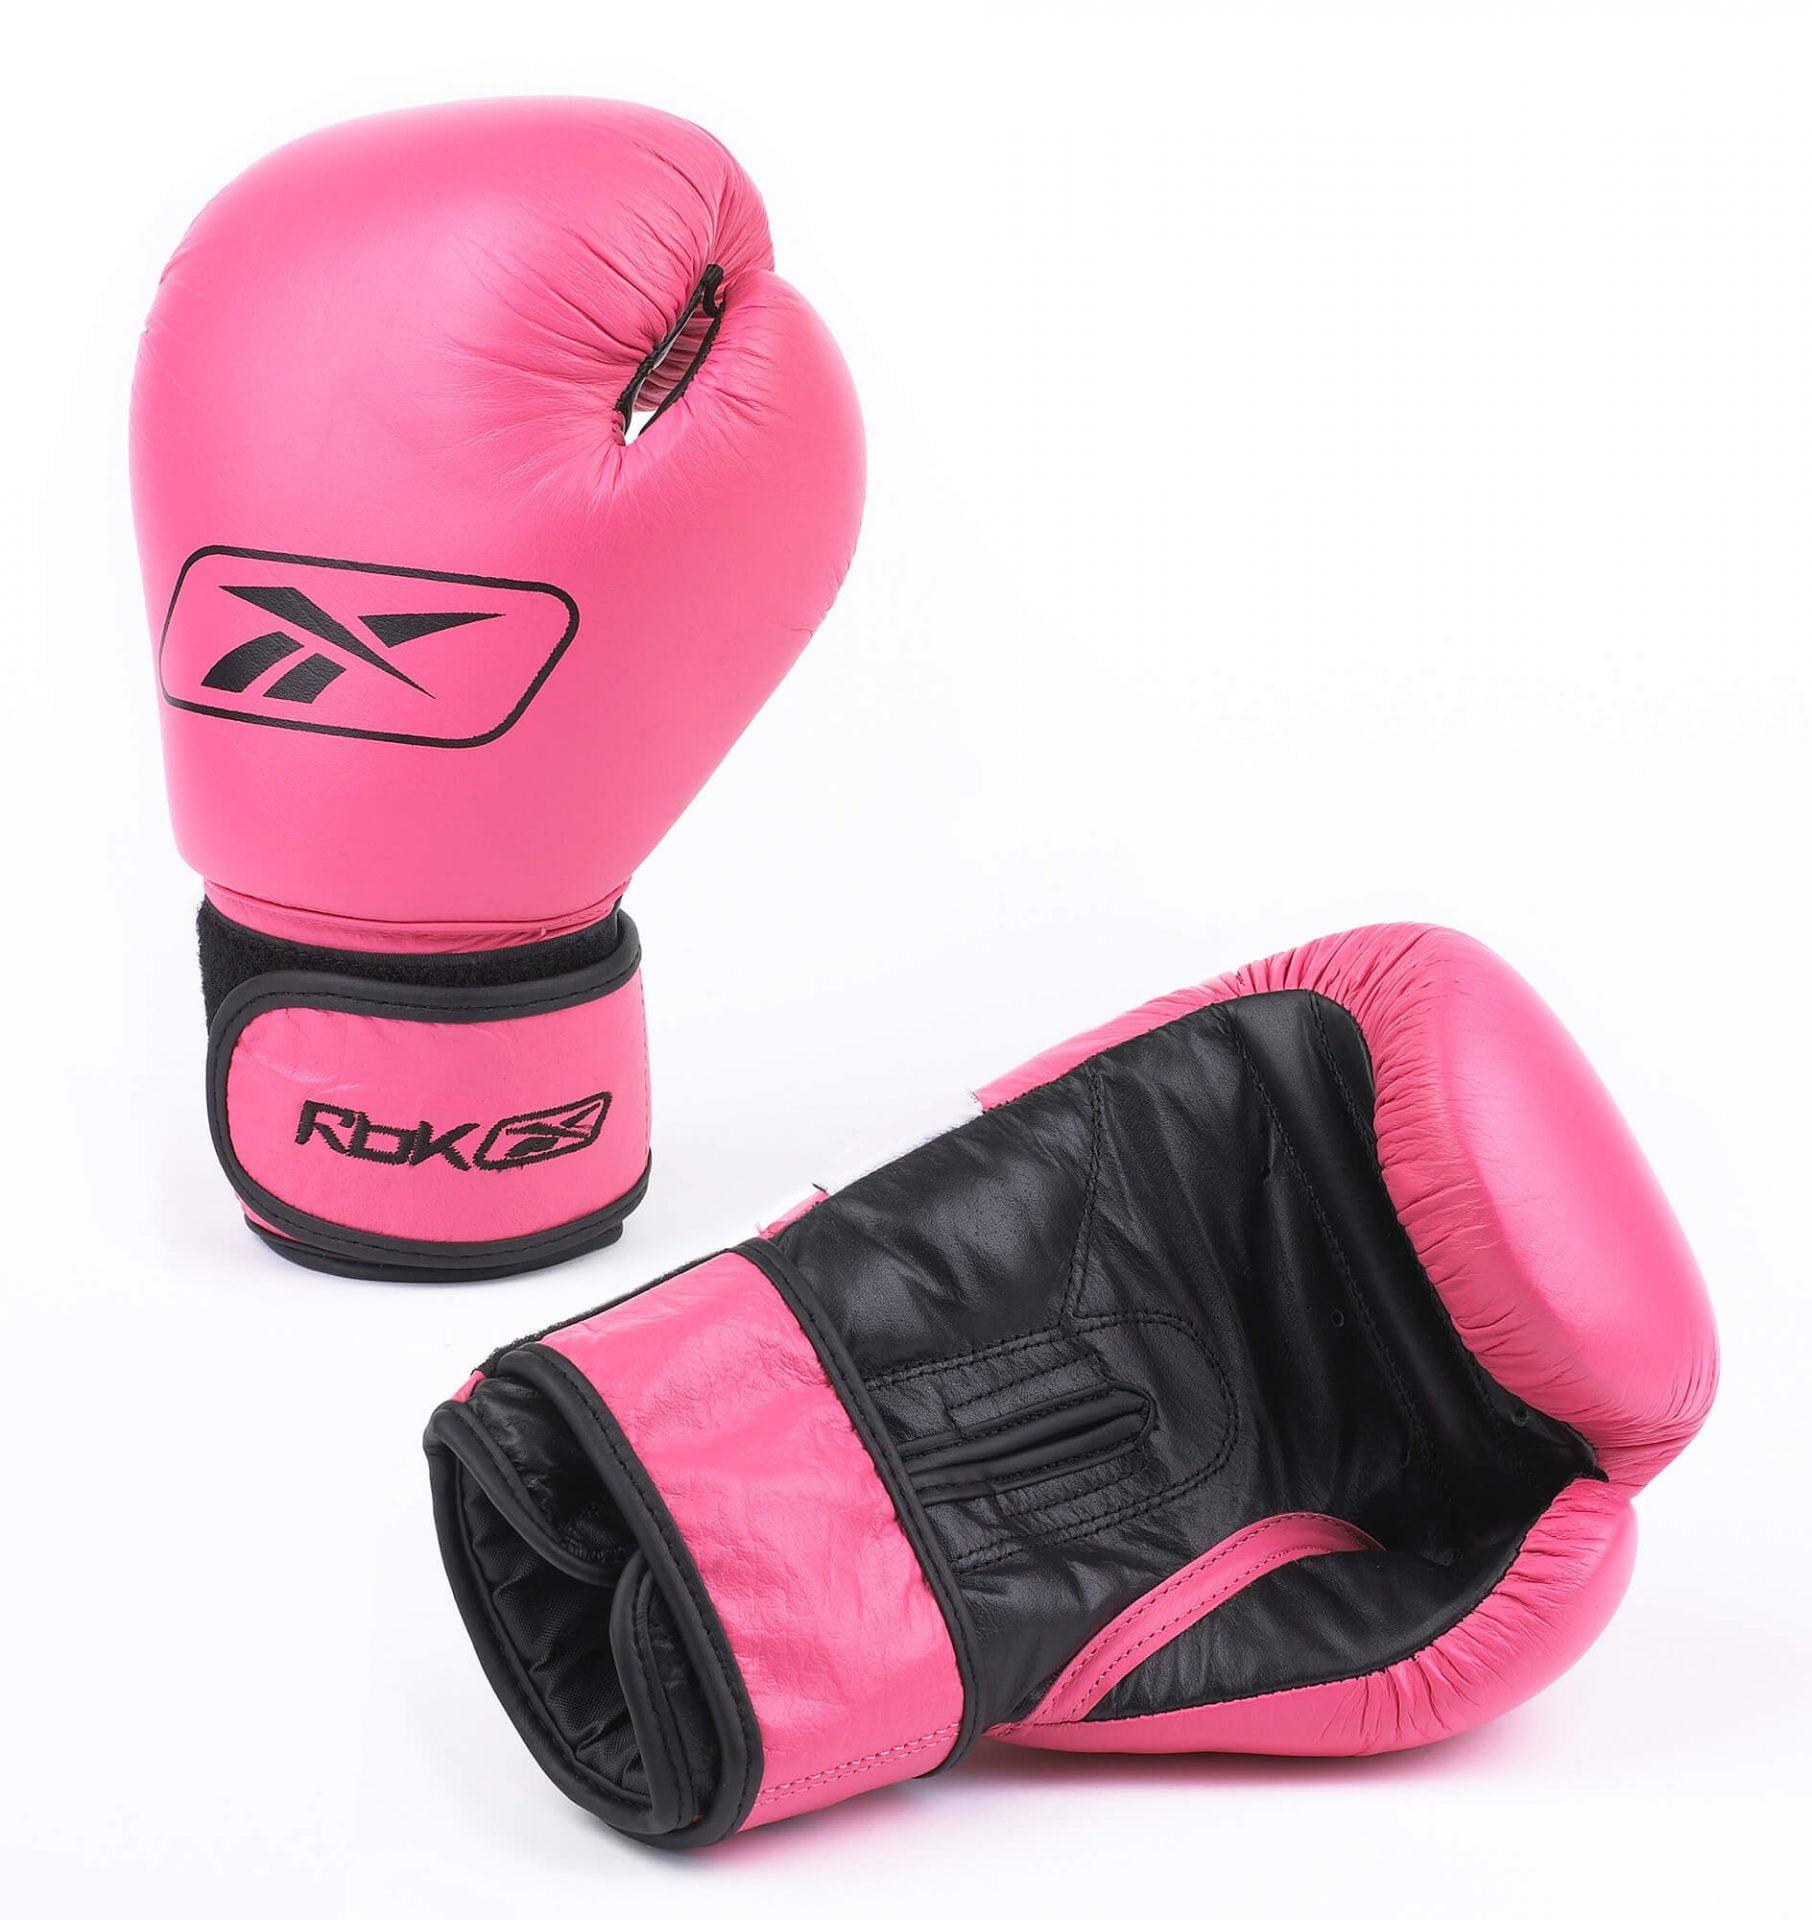 Boxing Gloves Packshot Photography